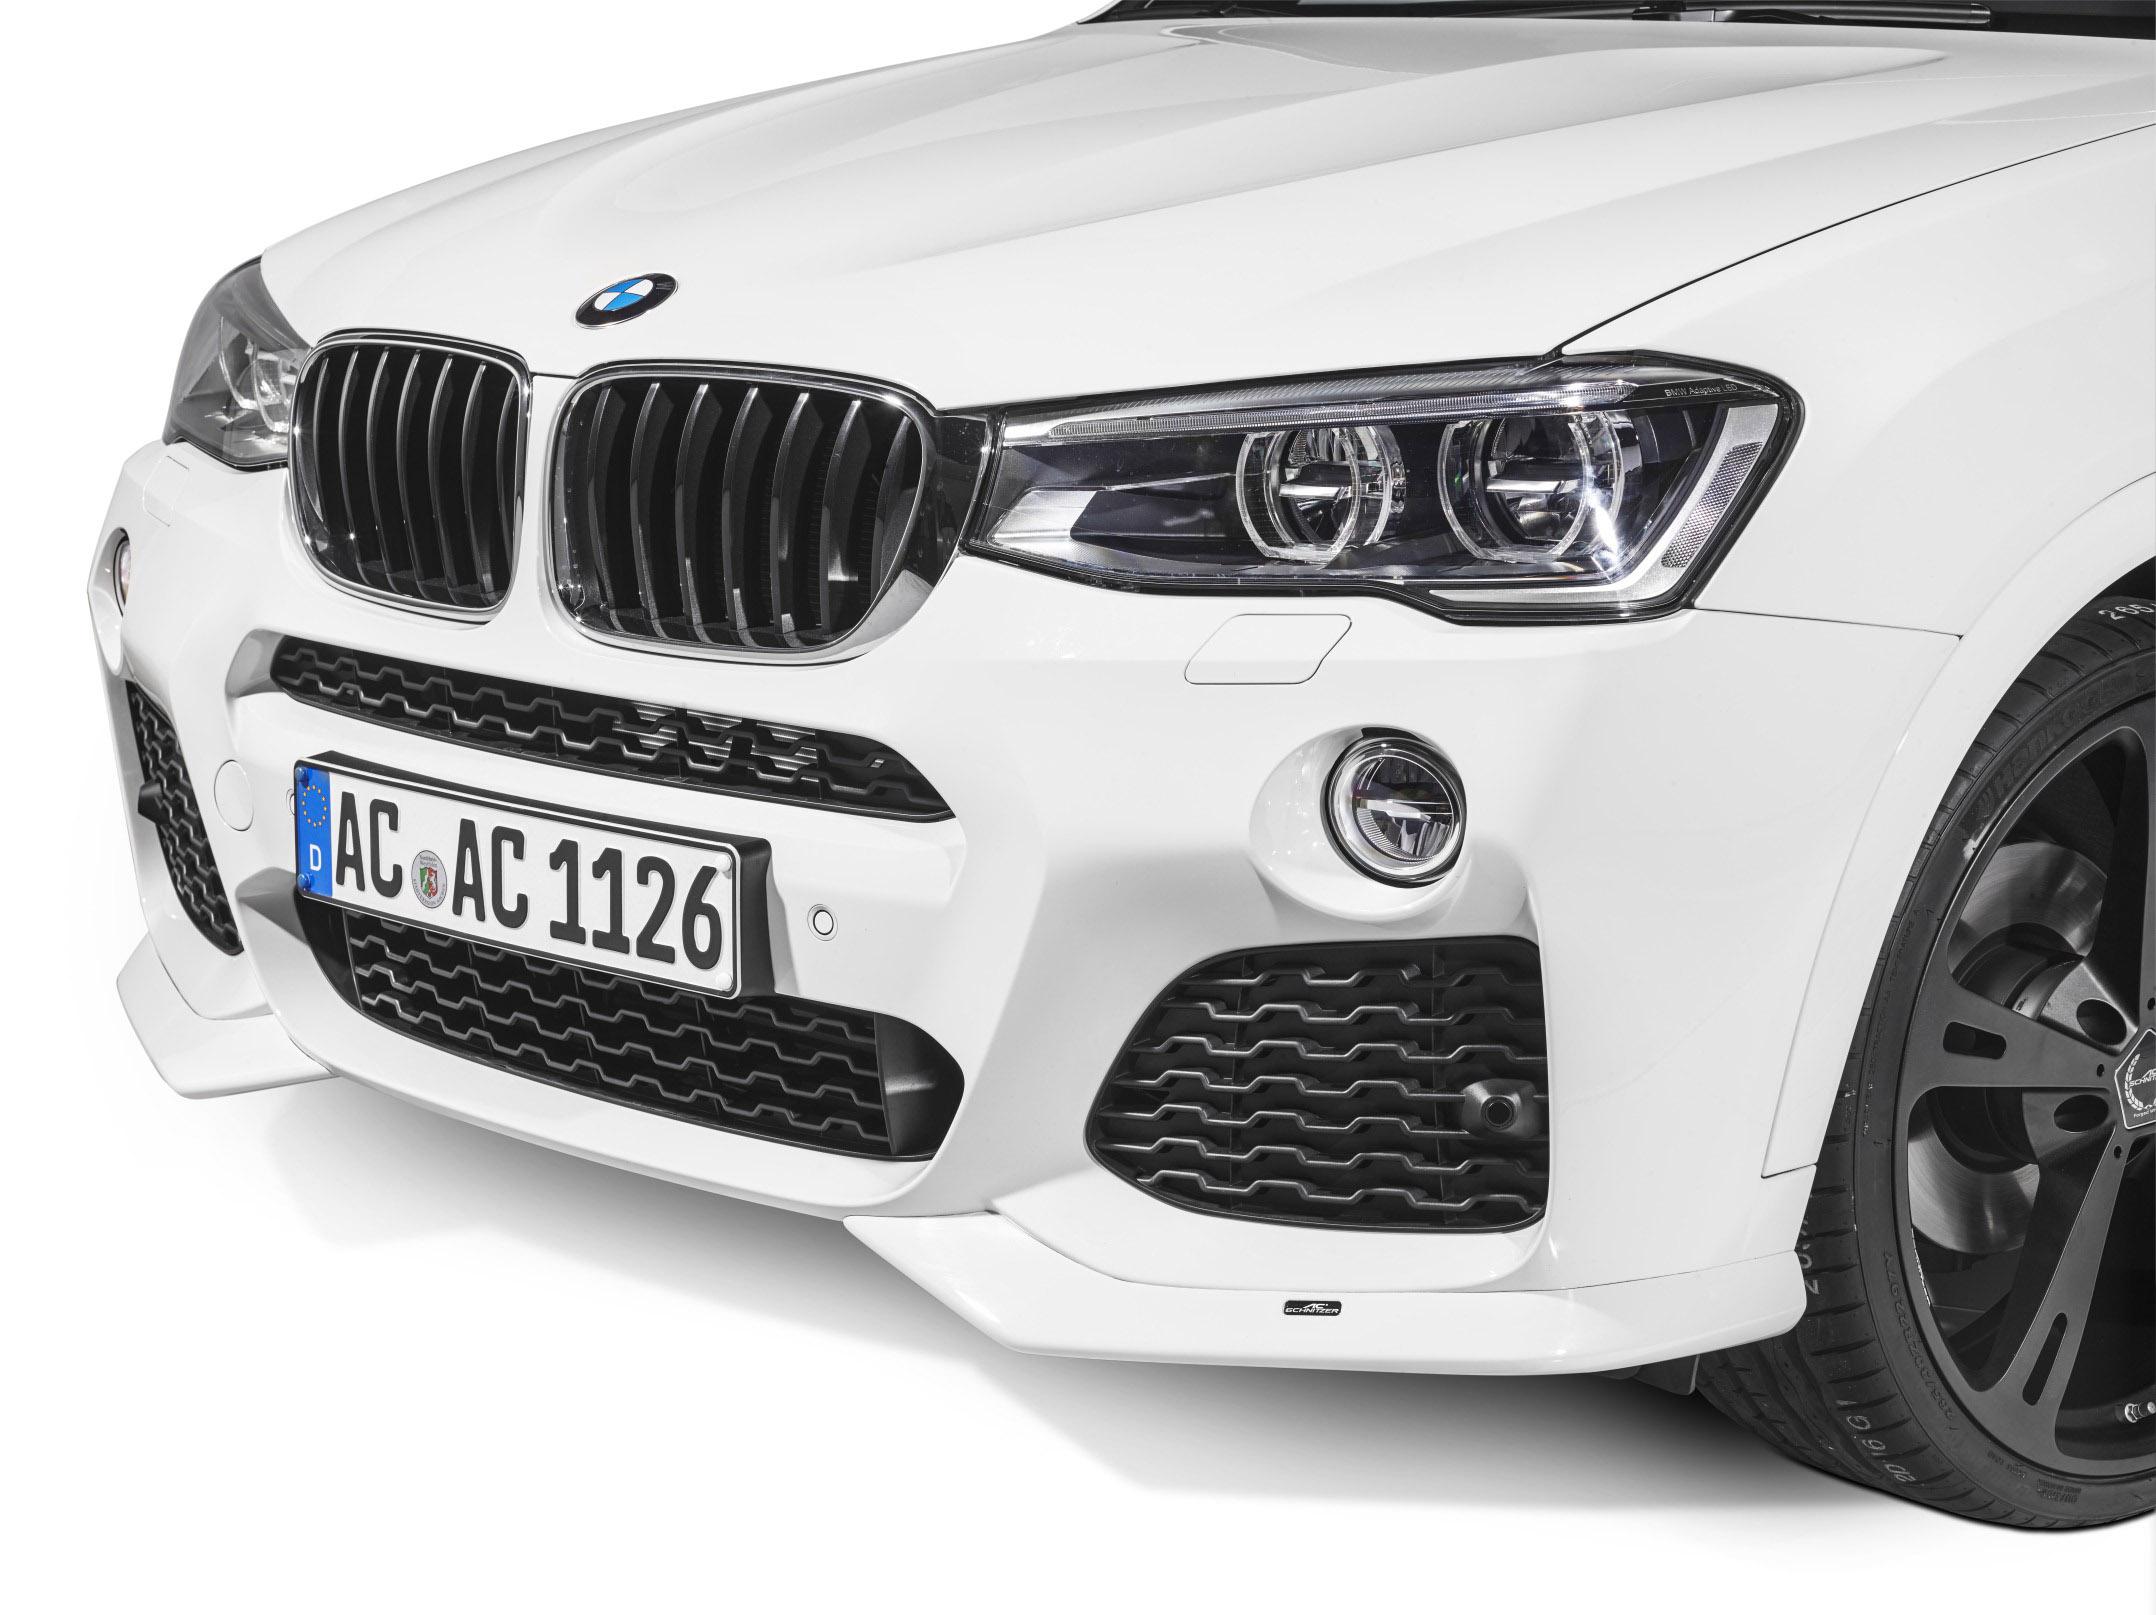 АС Шнитцер представлена на BMW х4 в невероятно спортивная версия - фотография №2